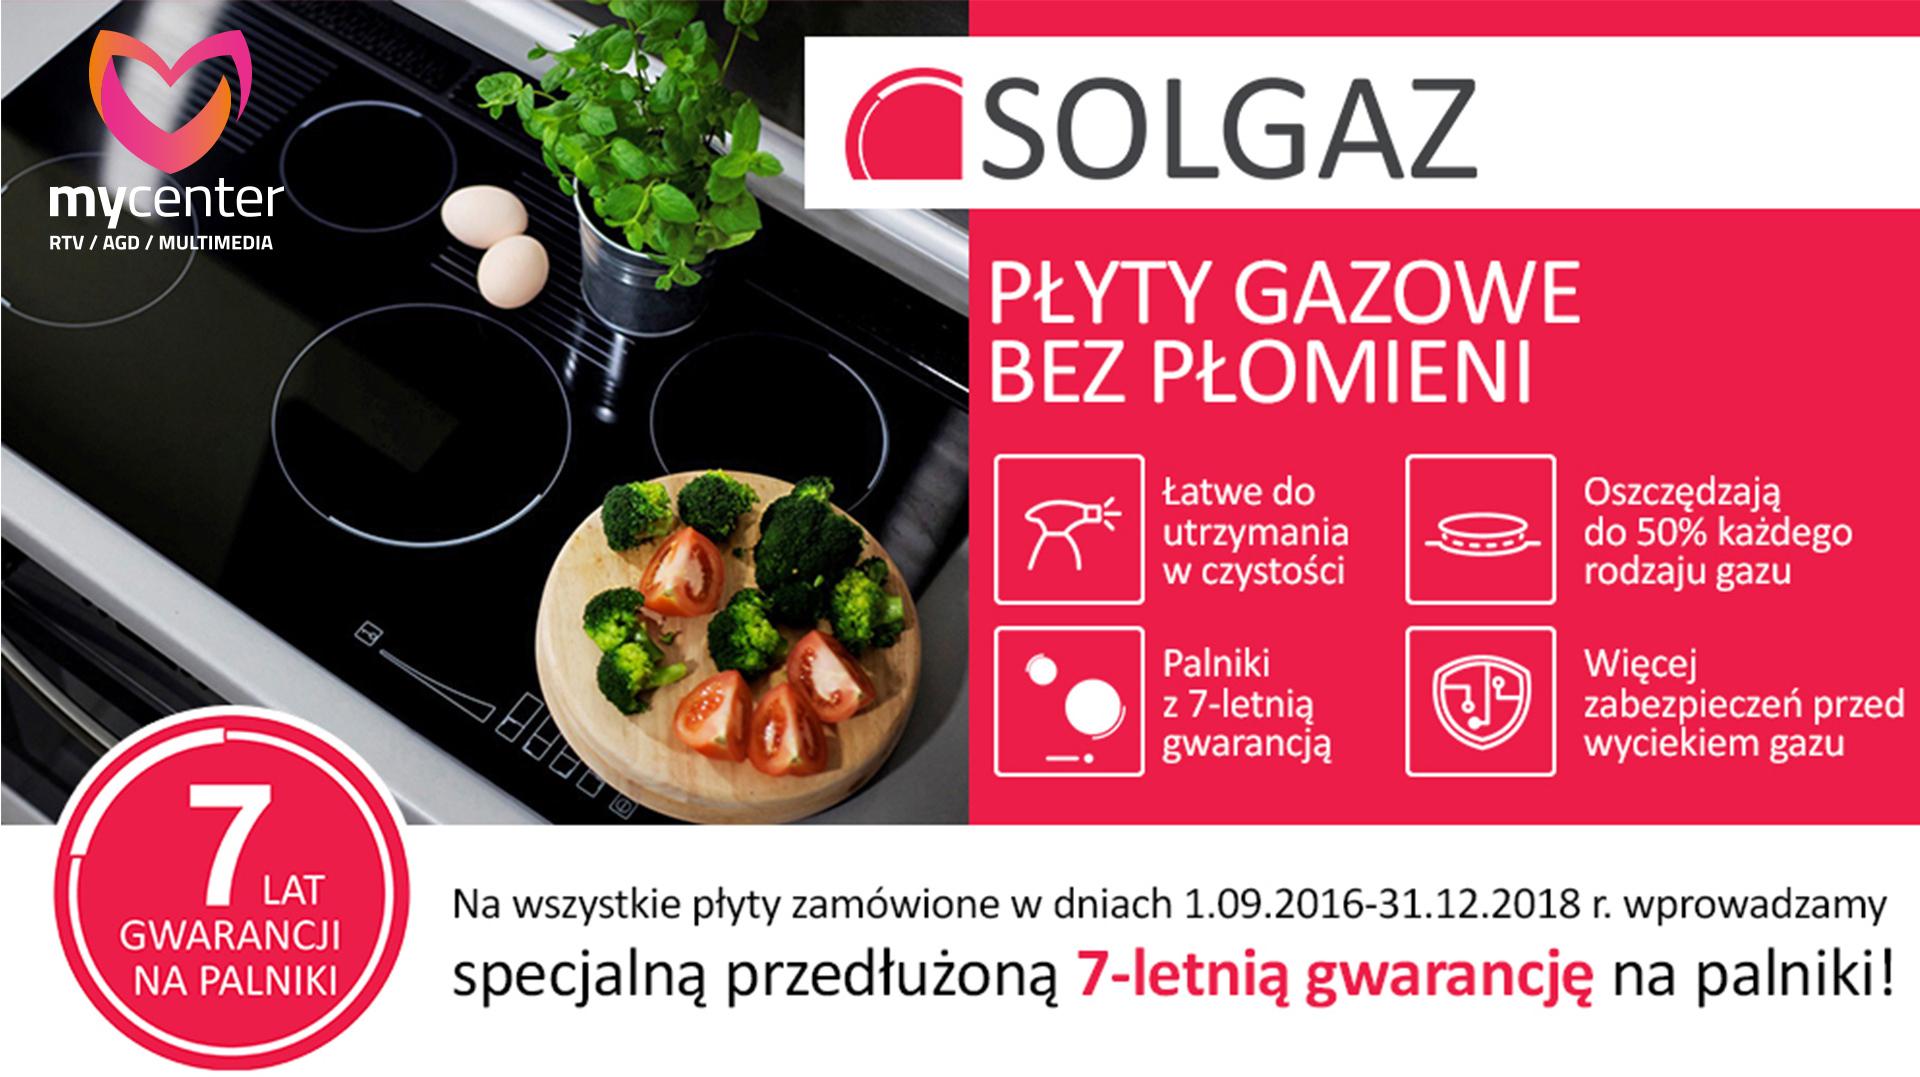 aktualne_promocje_1920x1077_Solgaz